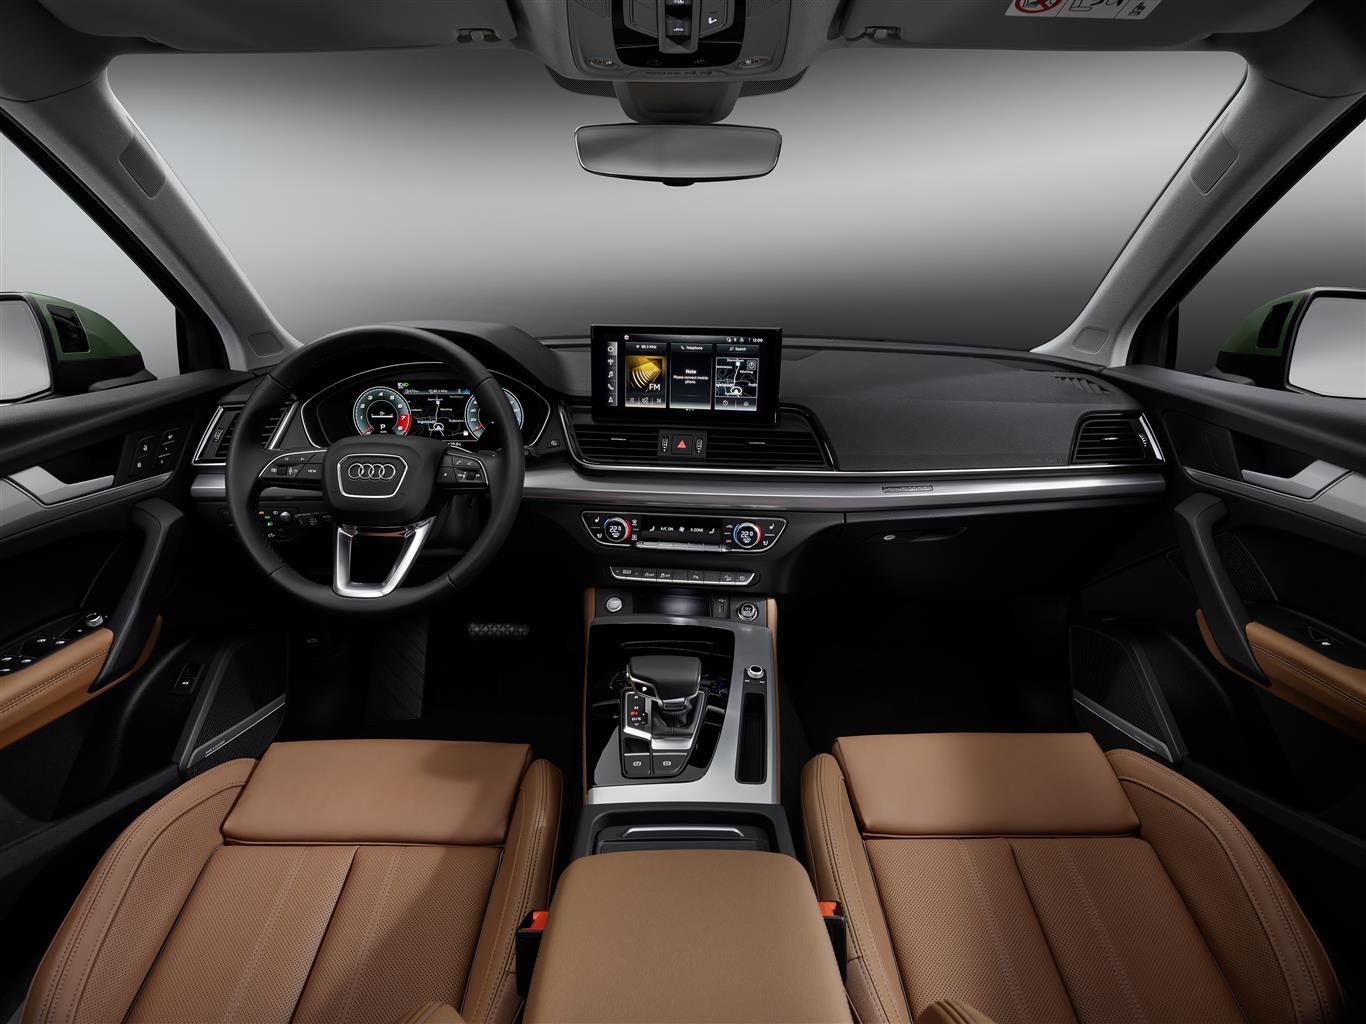 Nuova Audi Q5 interni